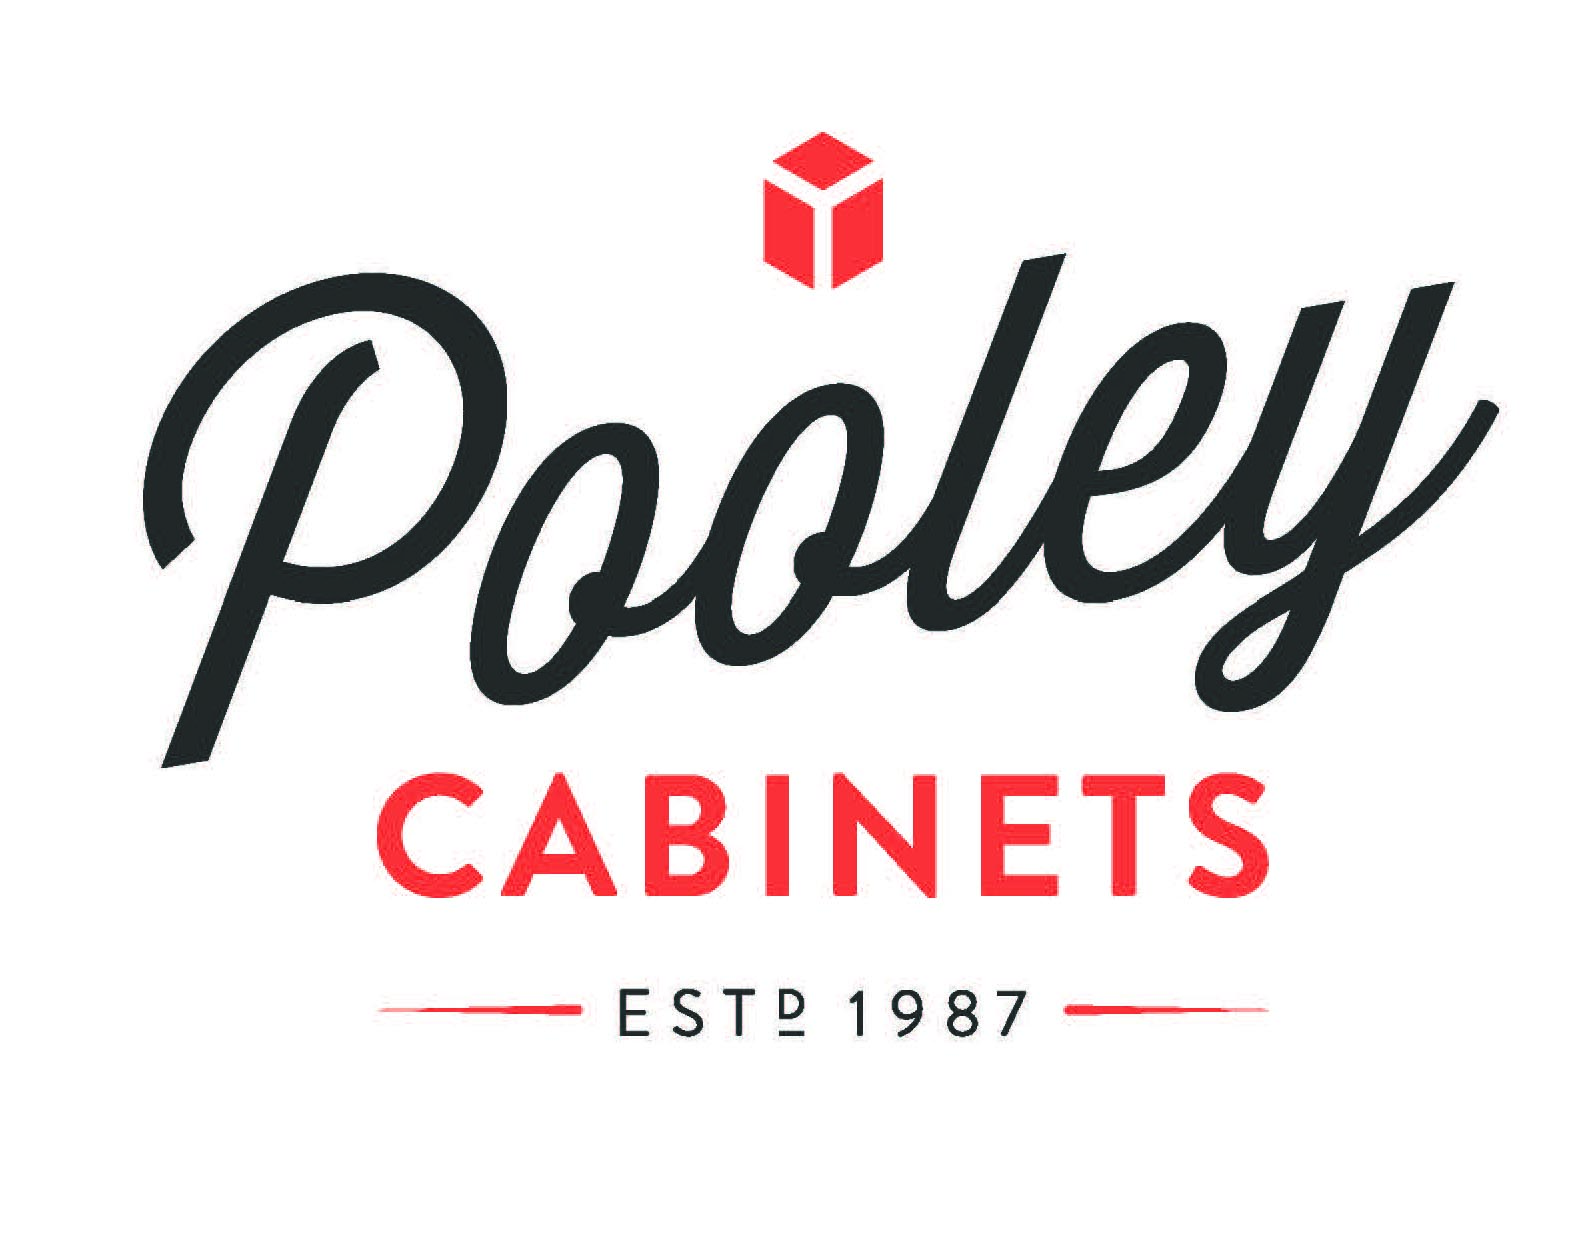 Pooley Cabinet Industries Ltd.